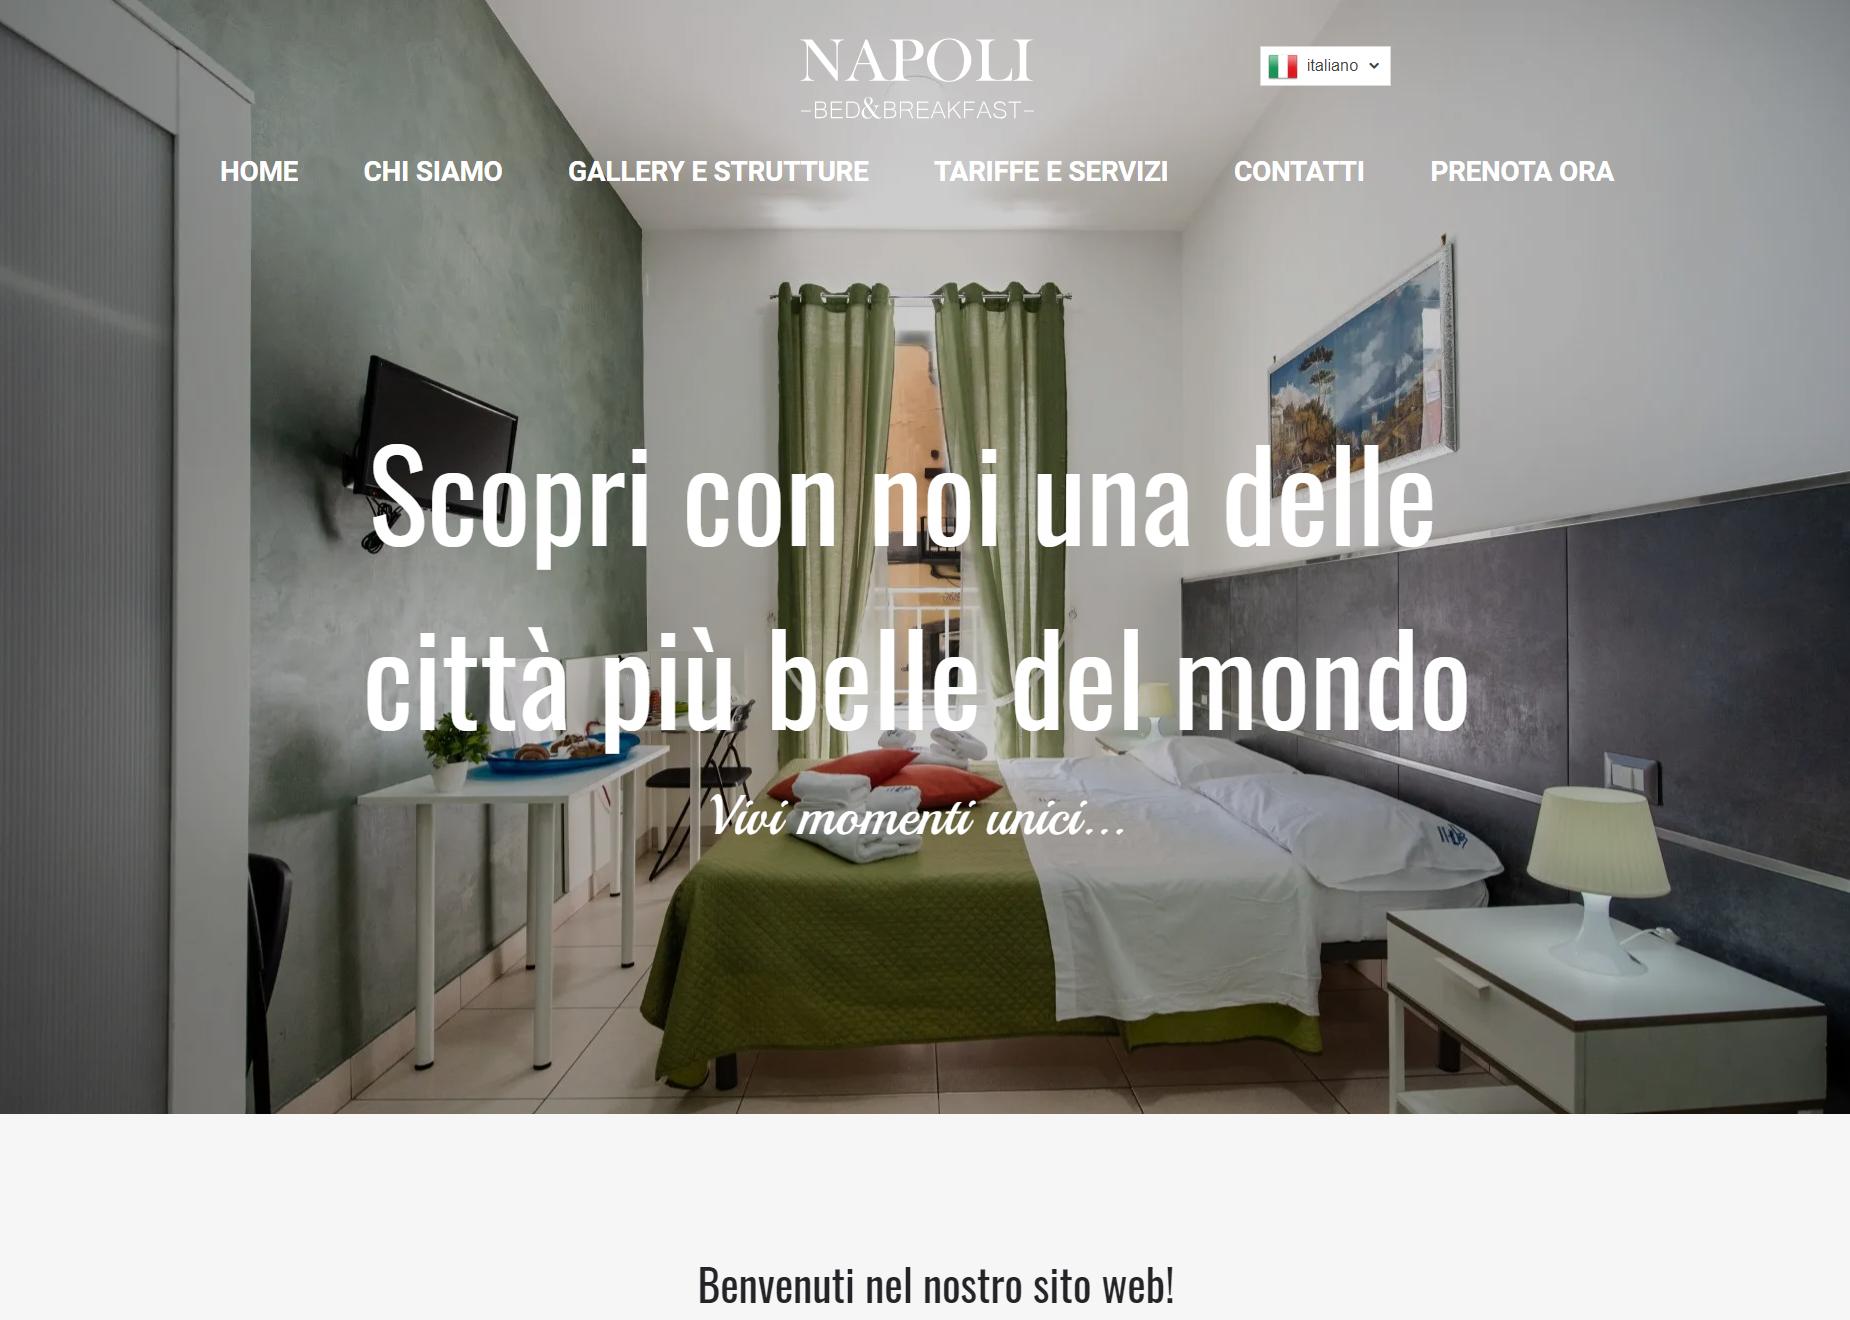 screencapture-napolibeb-it-2020-06-01-16_59_21 (1)